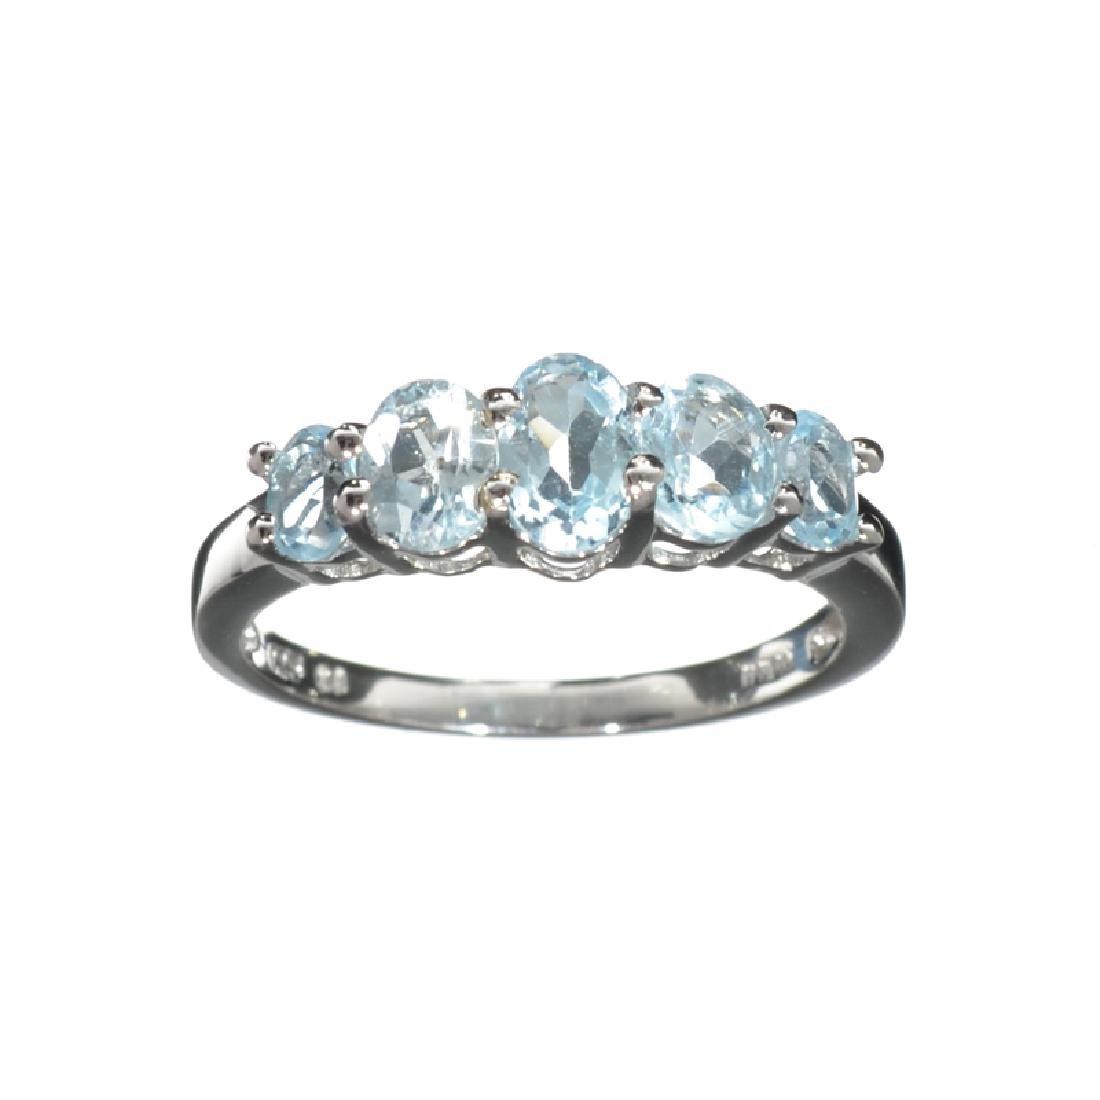 APP: 0.2k Fine Jewelry 1.91CT Oval Cut Blue Topaz And